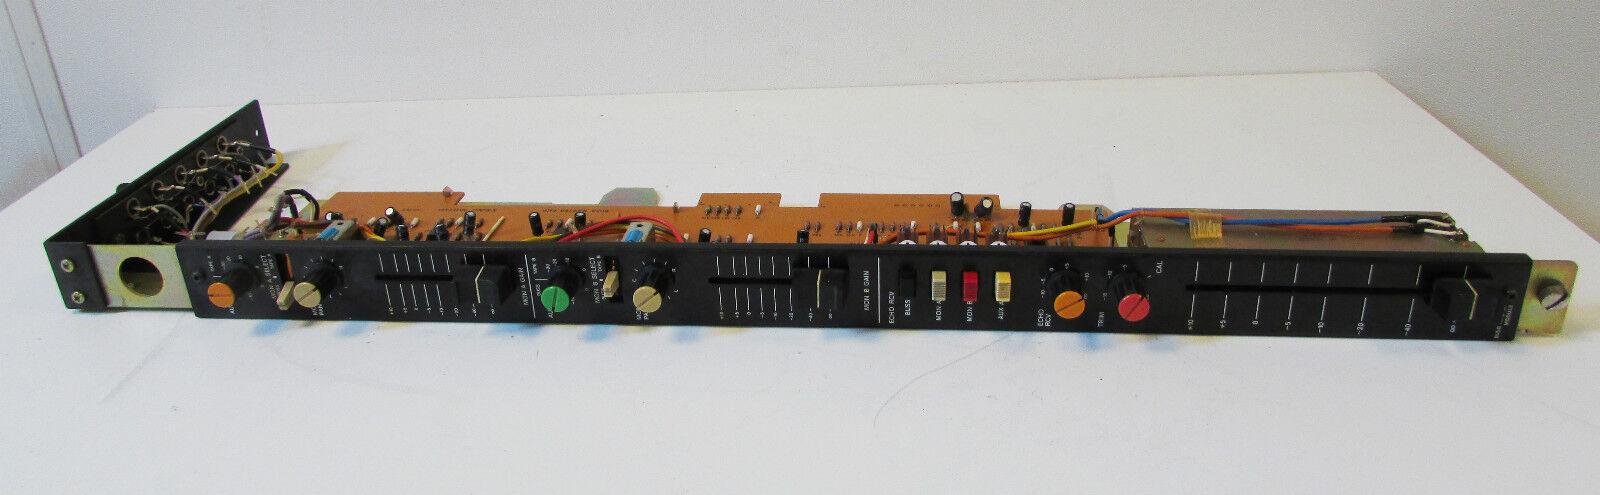 Teac Model 15 Buss master module   group module, shopstock